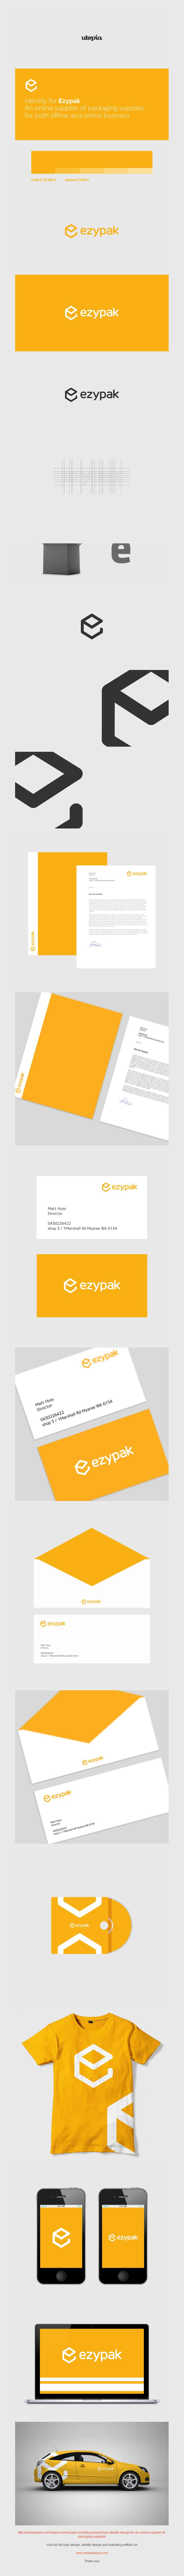 Ezypak logo and corporate identity design by Utopia Branding Agency1